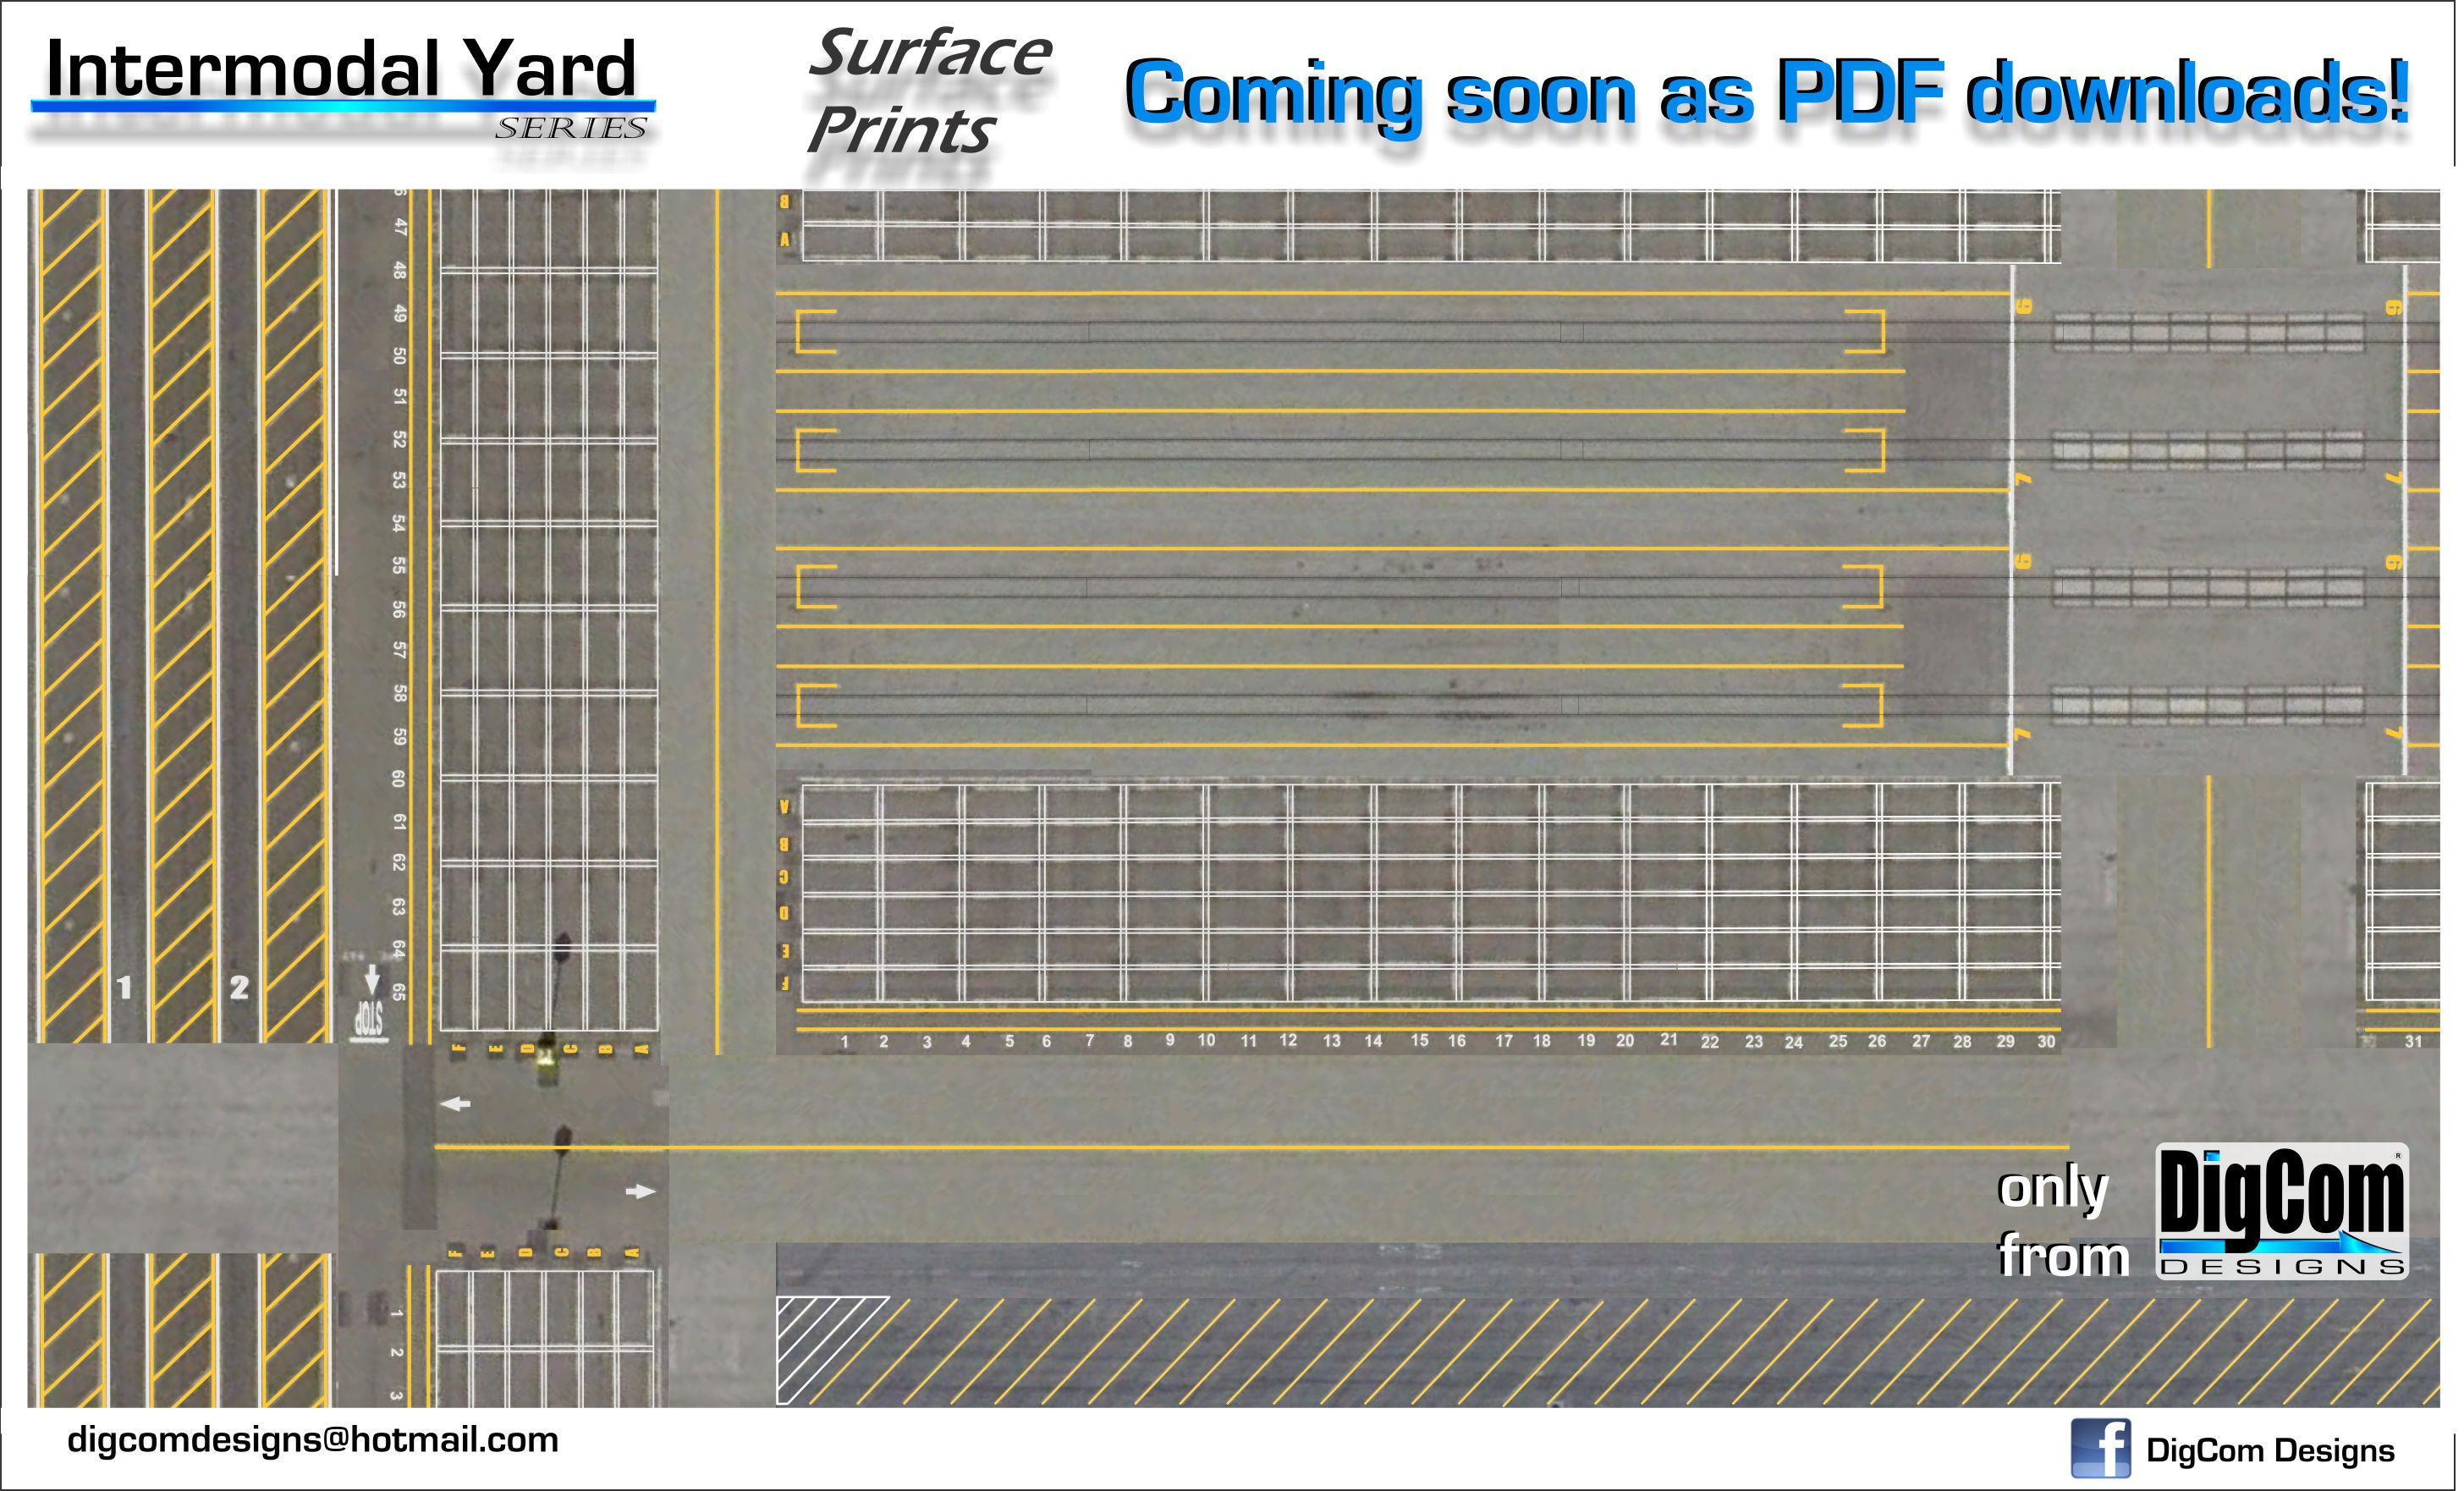 Intermodal Yard set Promo Design.jpg